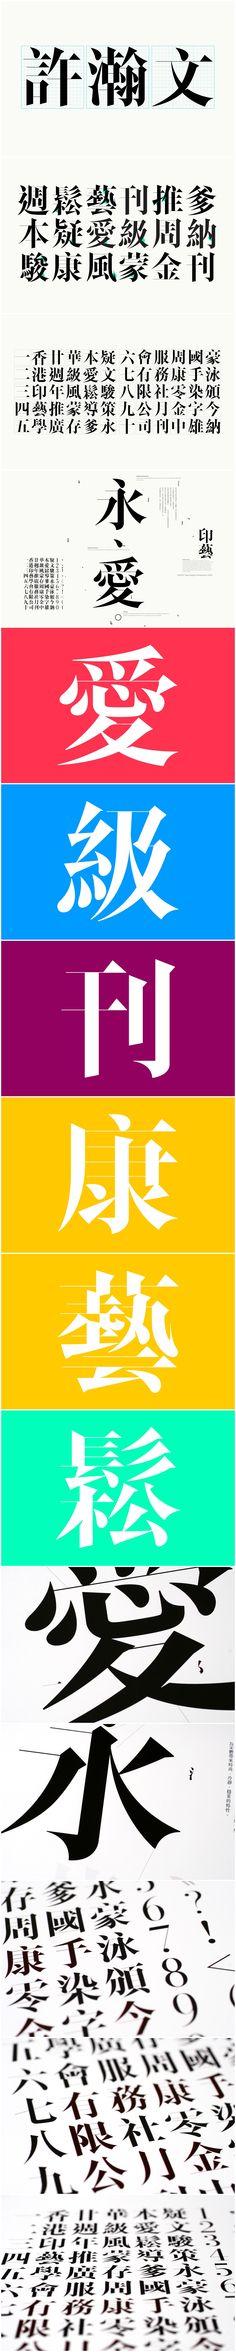 GAAHK Typeface Design Competition    via  http://www.juliushui.com/html/works/gaahk/index.html